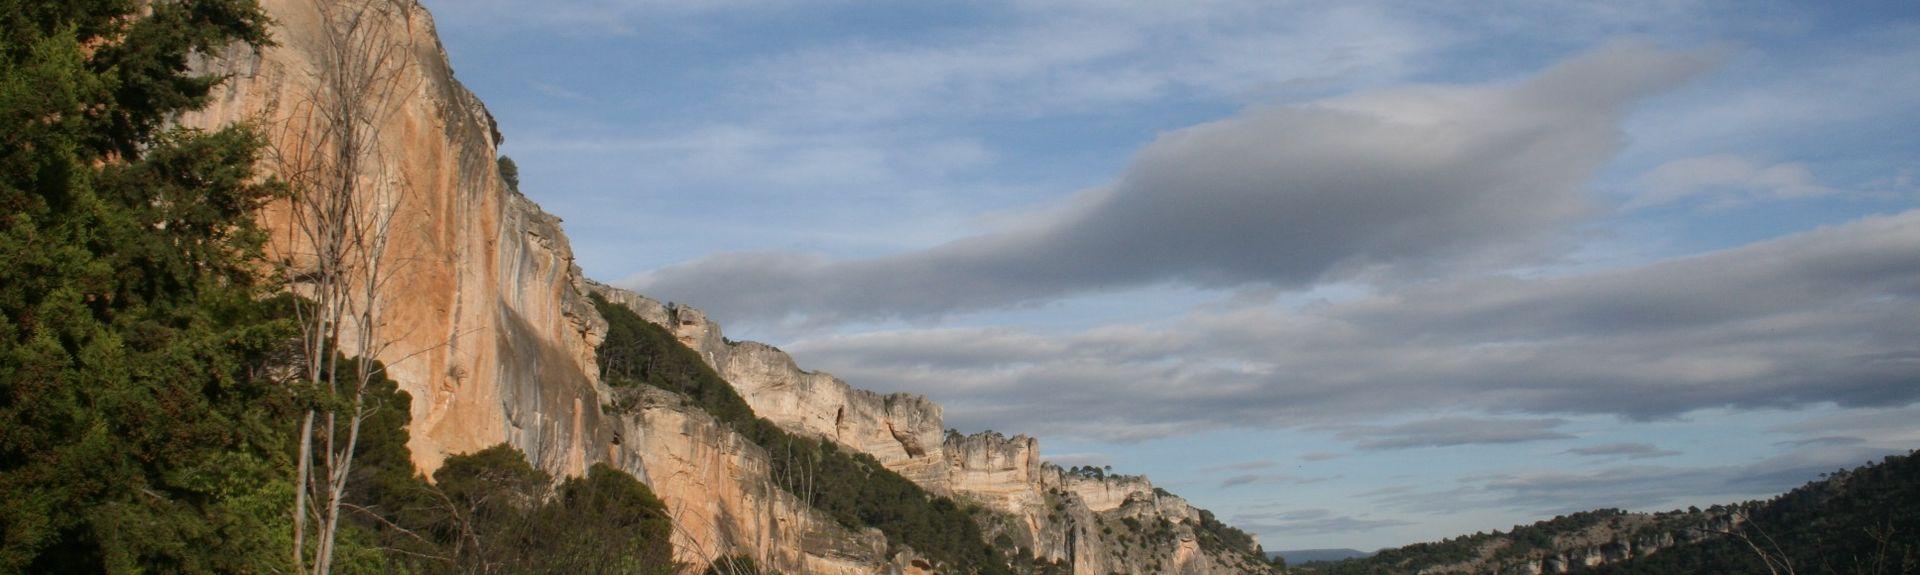 Fresneda de la Sierra, Cuenca, Spain